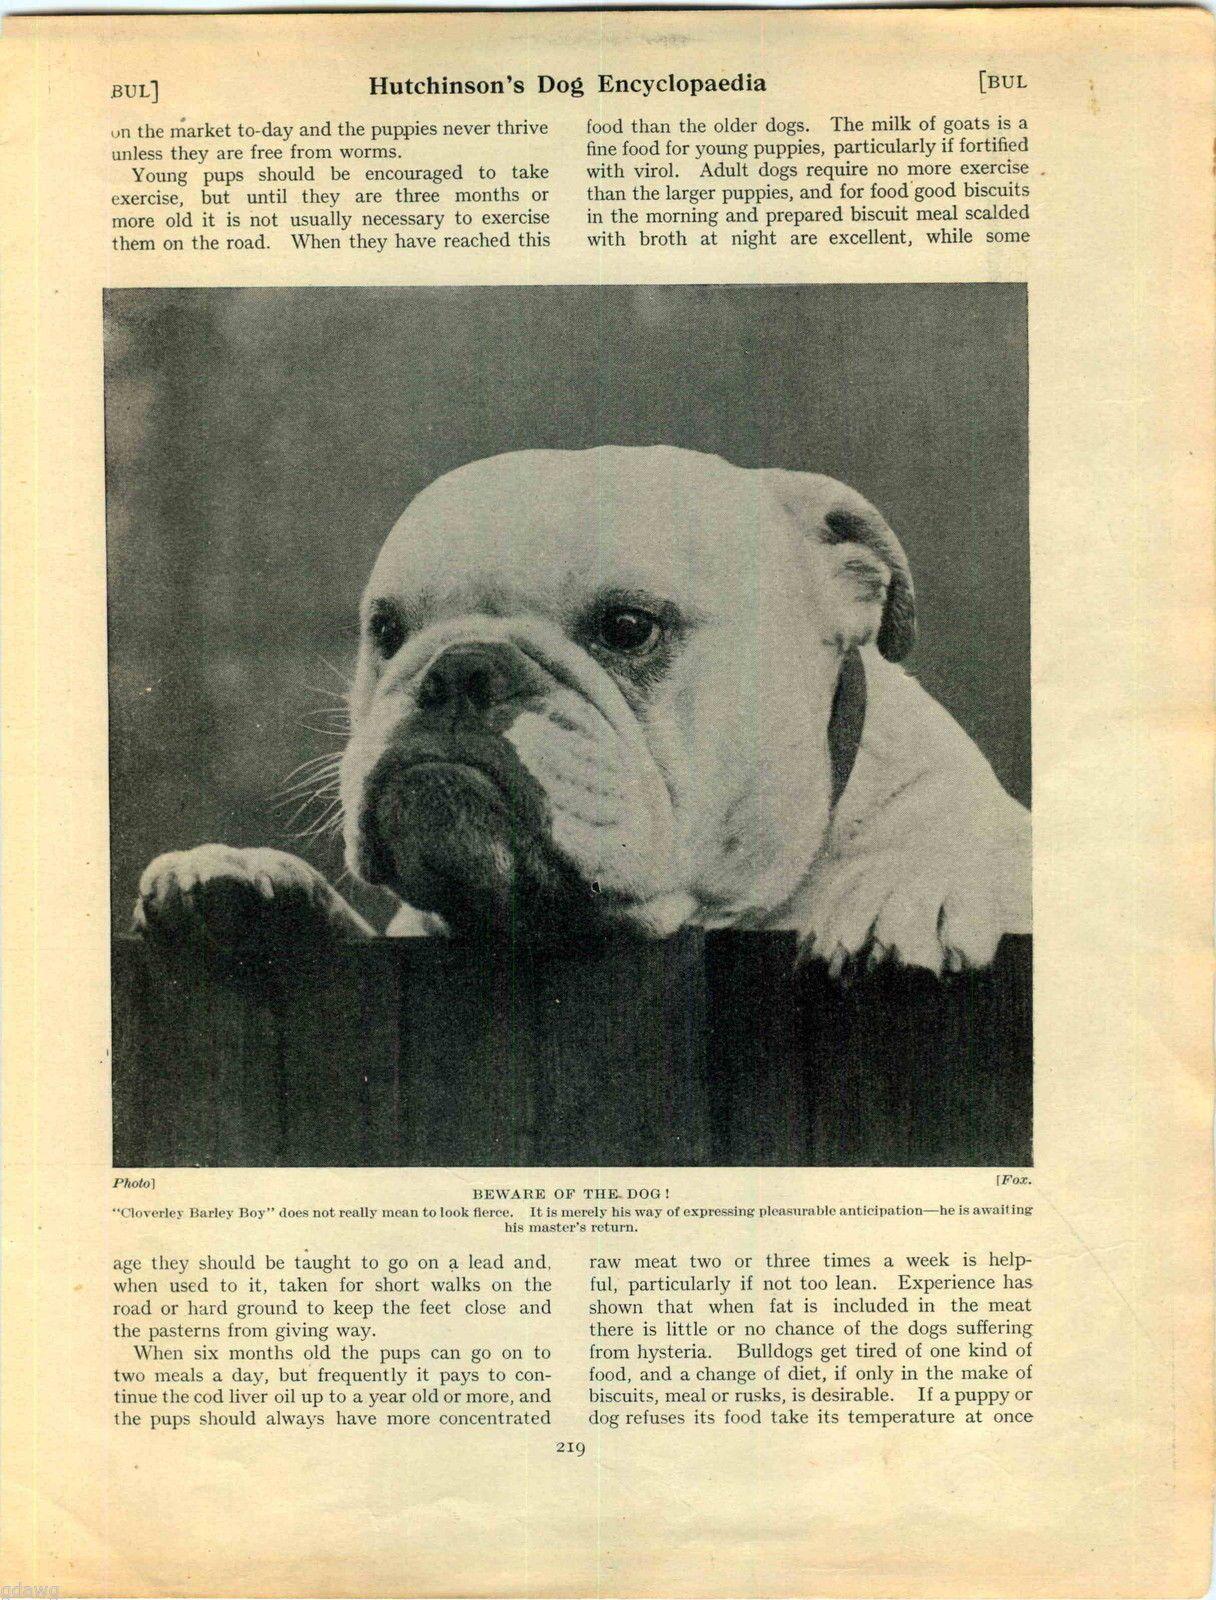 1930 Book Plate Print Bulldog Cloverley Barley Boy Juvenile Puppie ...